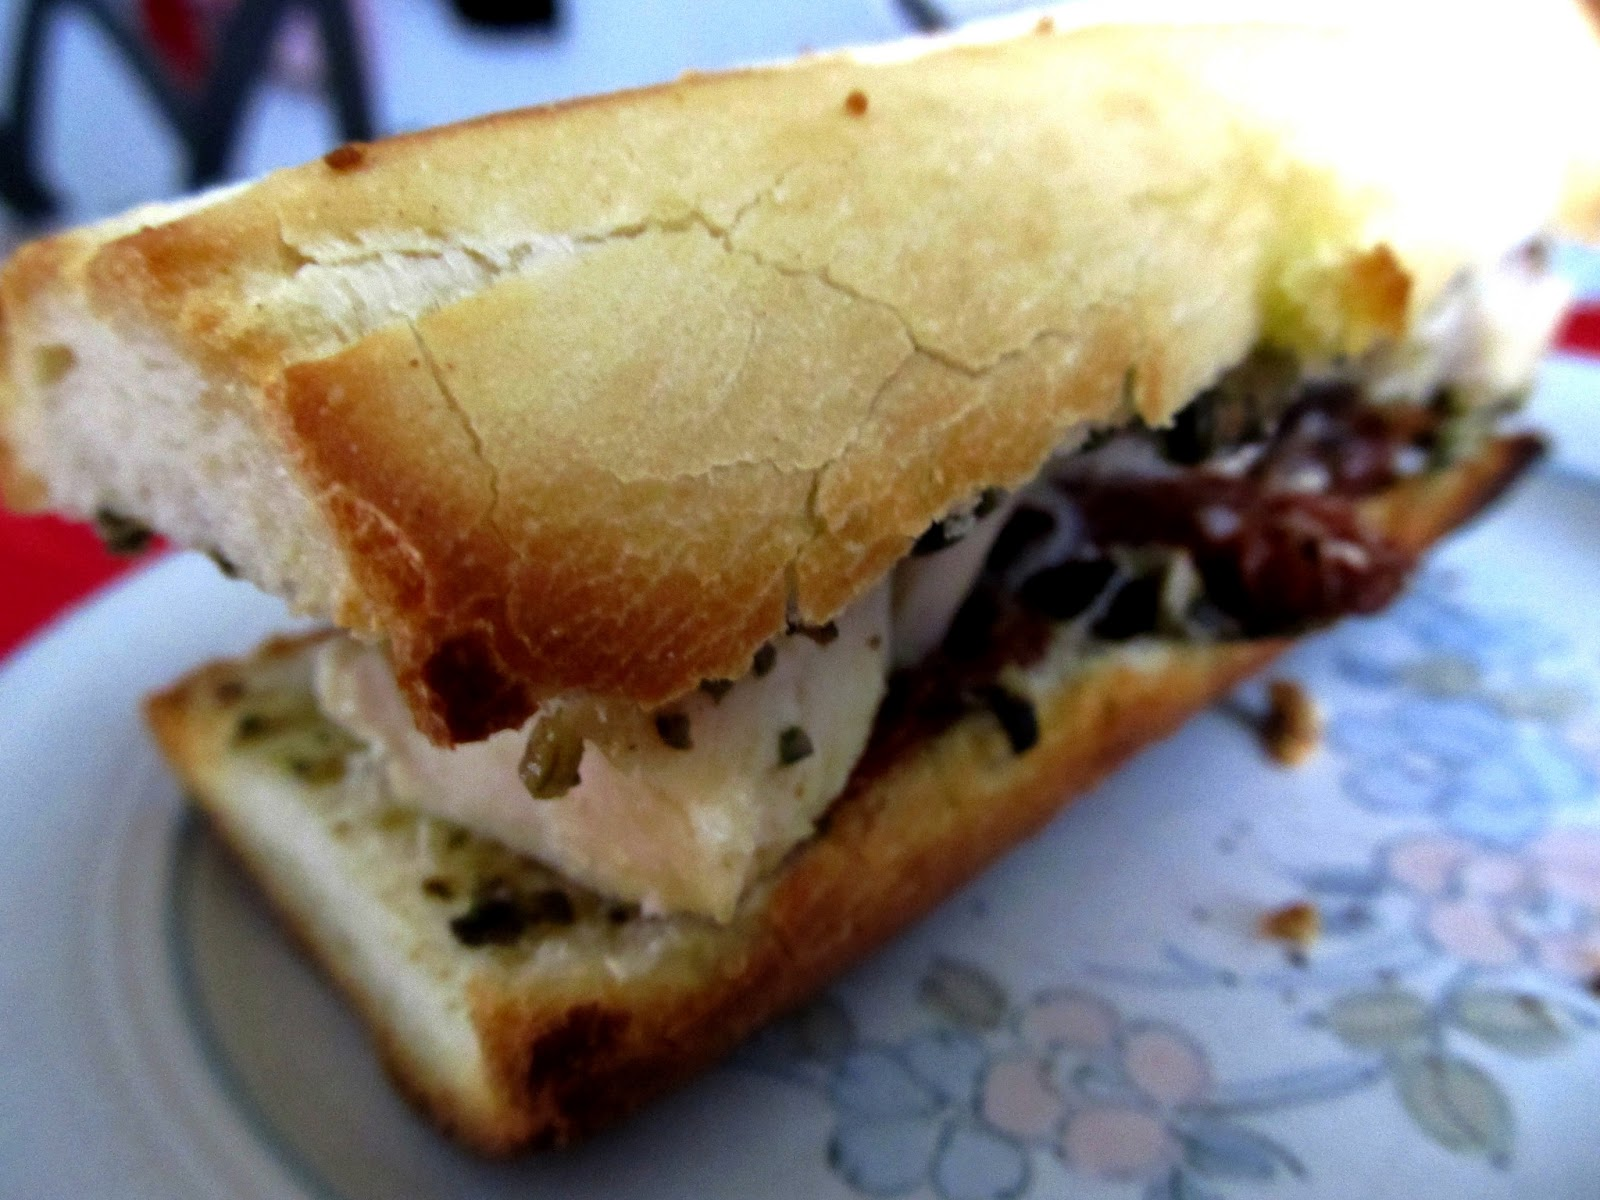 Lunch du mardi: Sandwich style méditérranéen